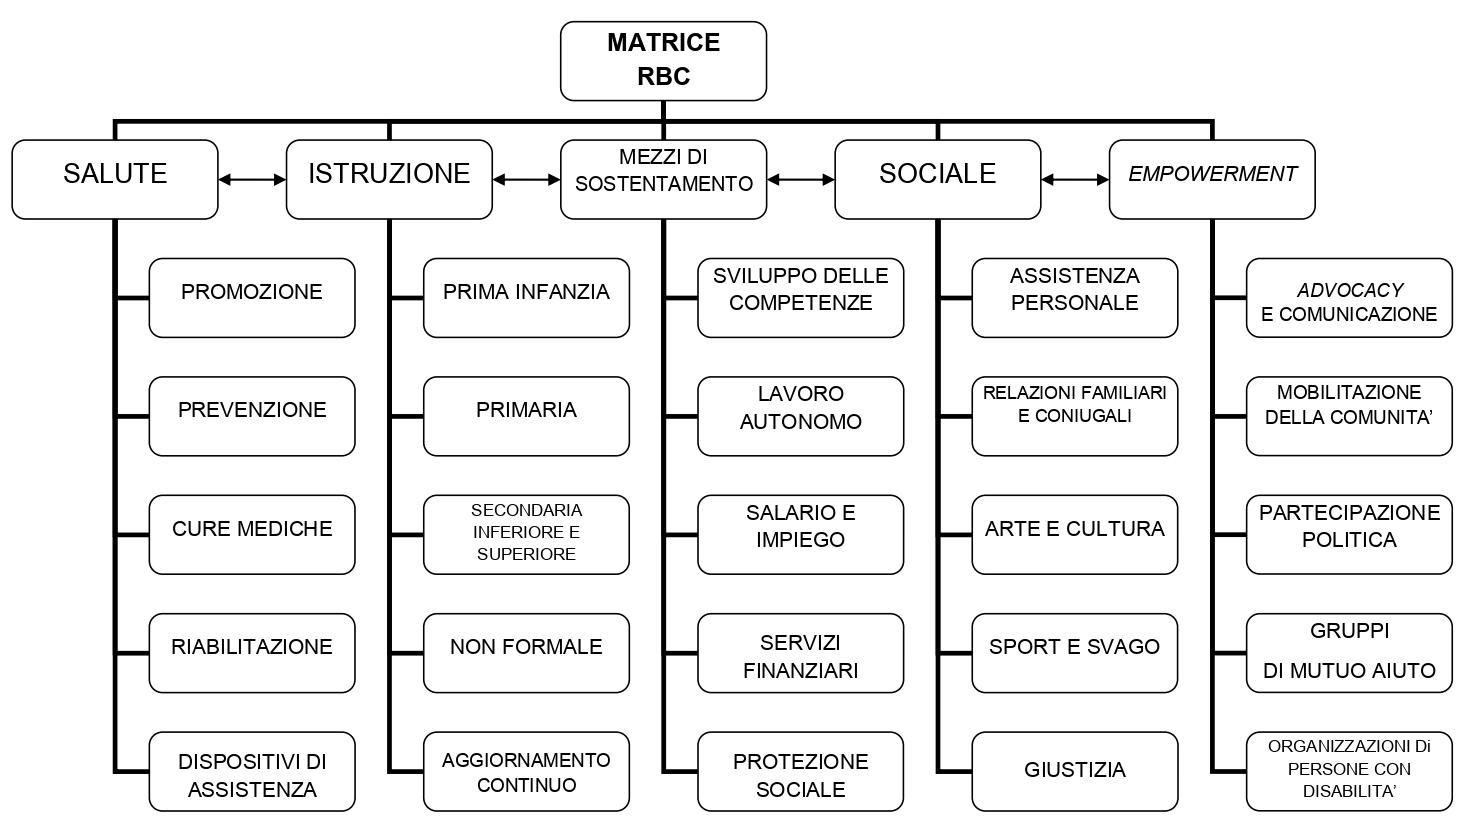 matrice RBC